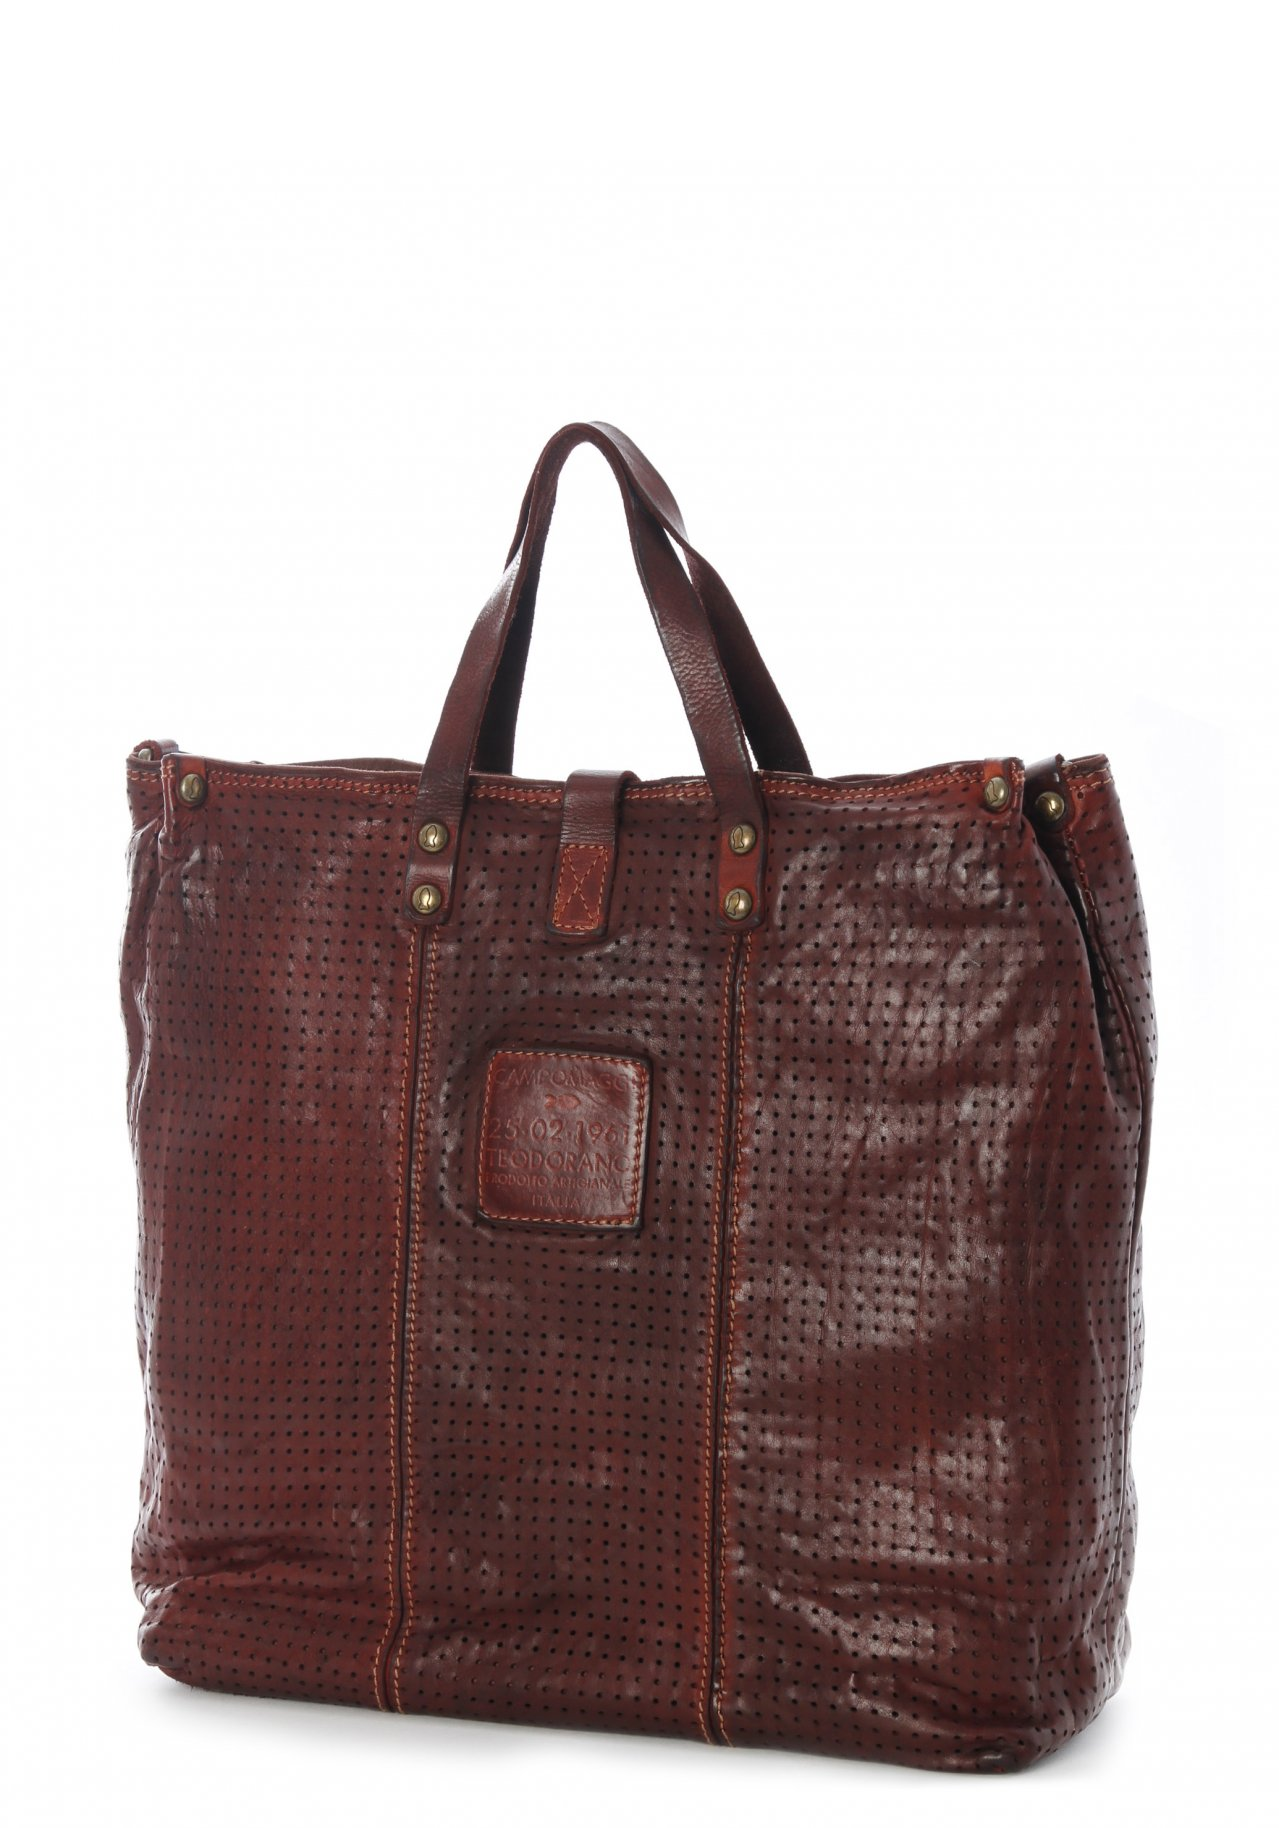 campomaggi la shopping handbag shopper nur. Black Bedroom Furniture Sets. Home Design Ideas